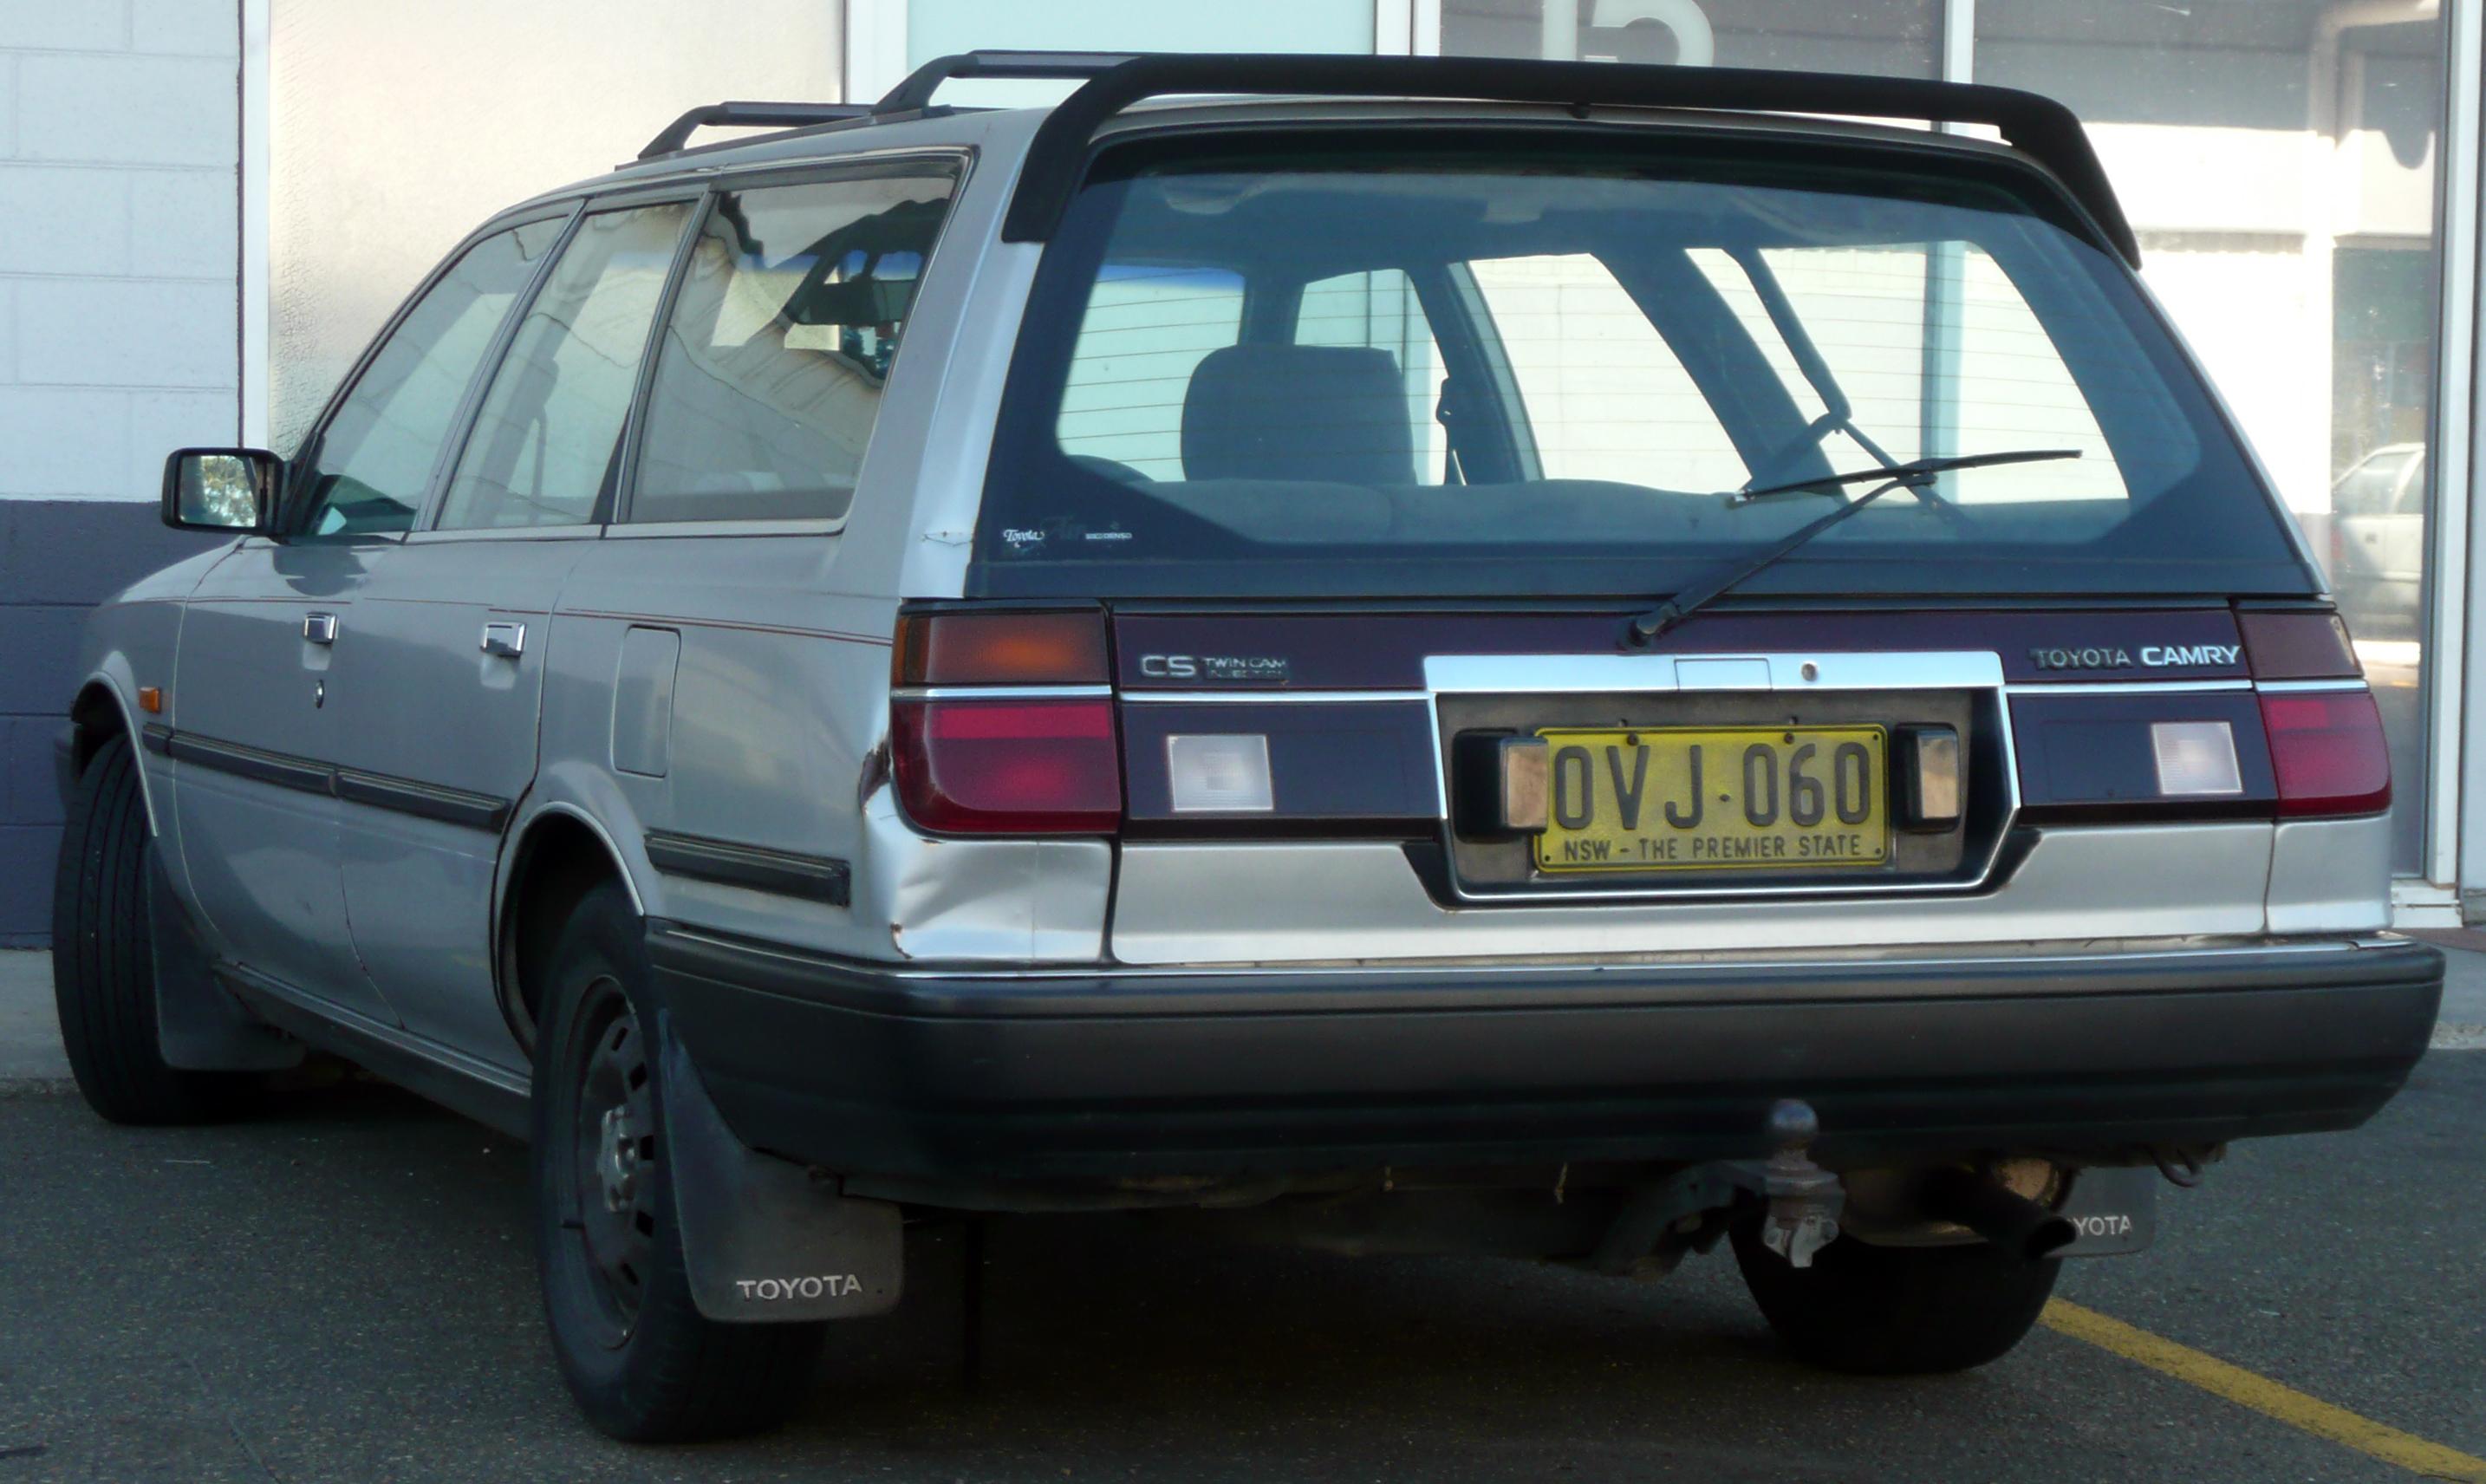 File 1987 Toyota Camry Sv21 Cs Station Wagon 2008 12 23 Jpg